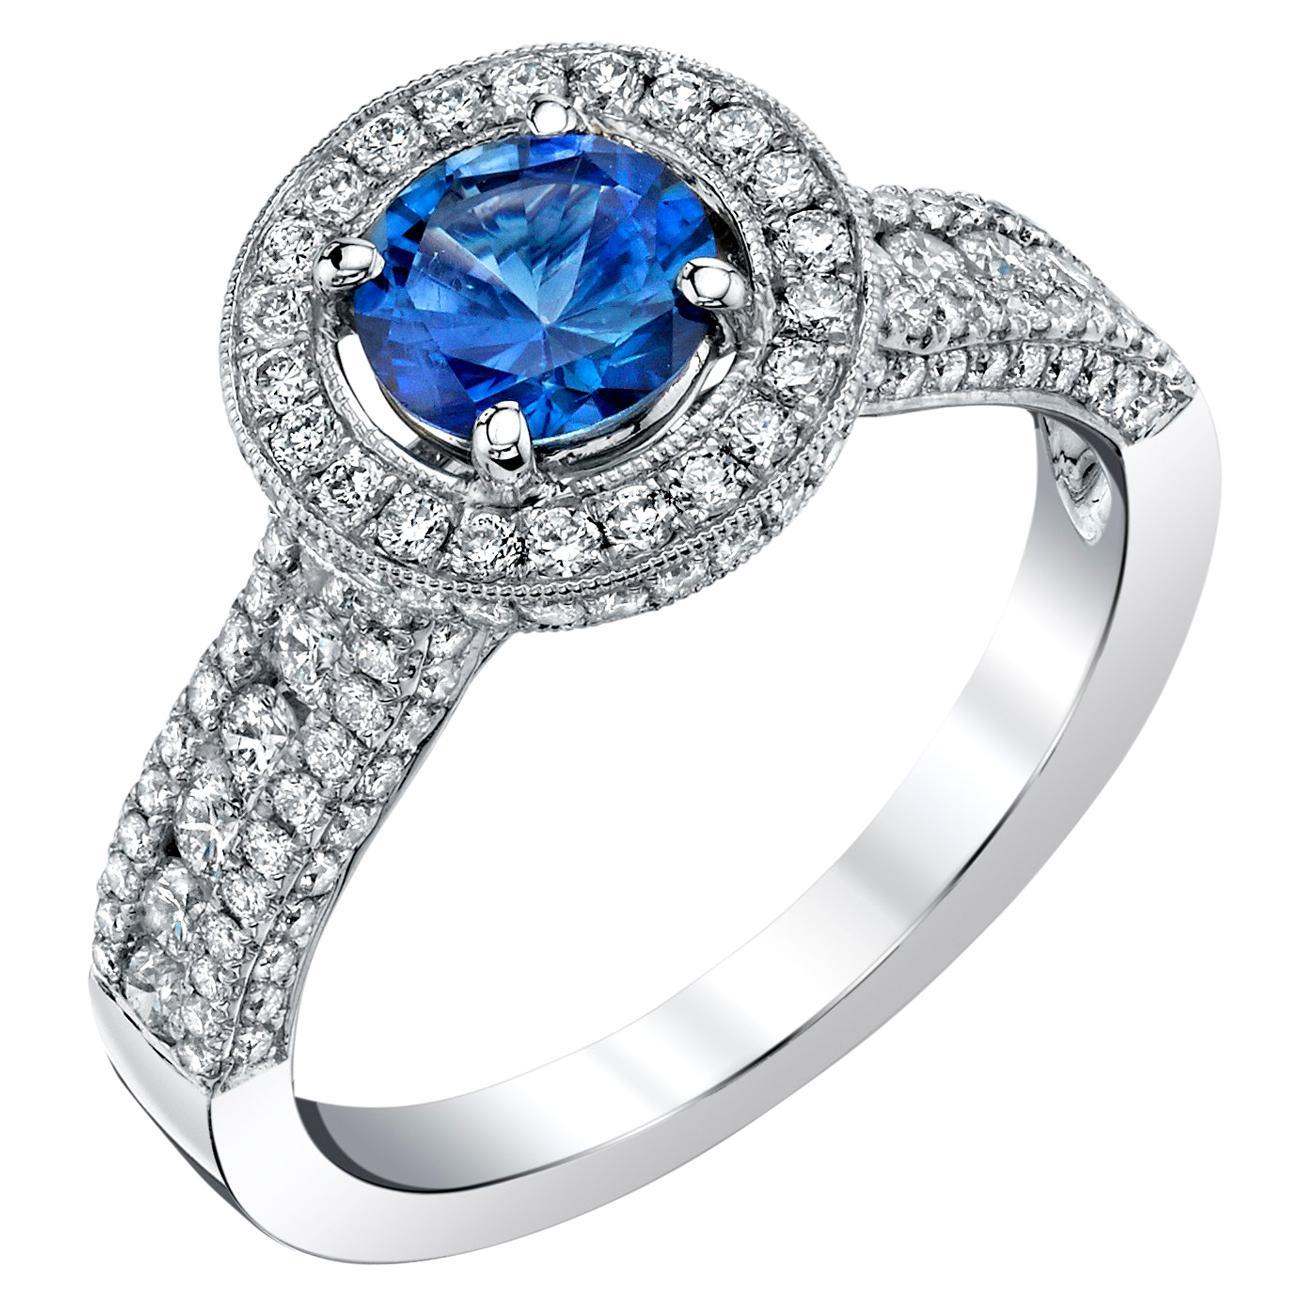 Cornflower Blue Sapphire, Pave Diamond Halo 18k White Gold Engagement Band Ring